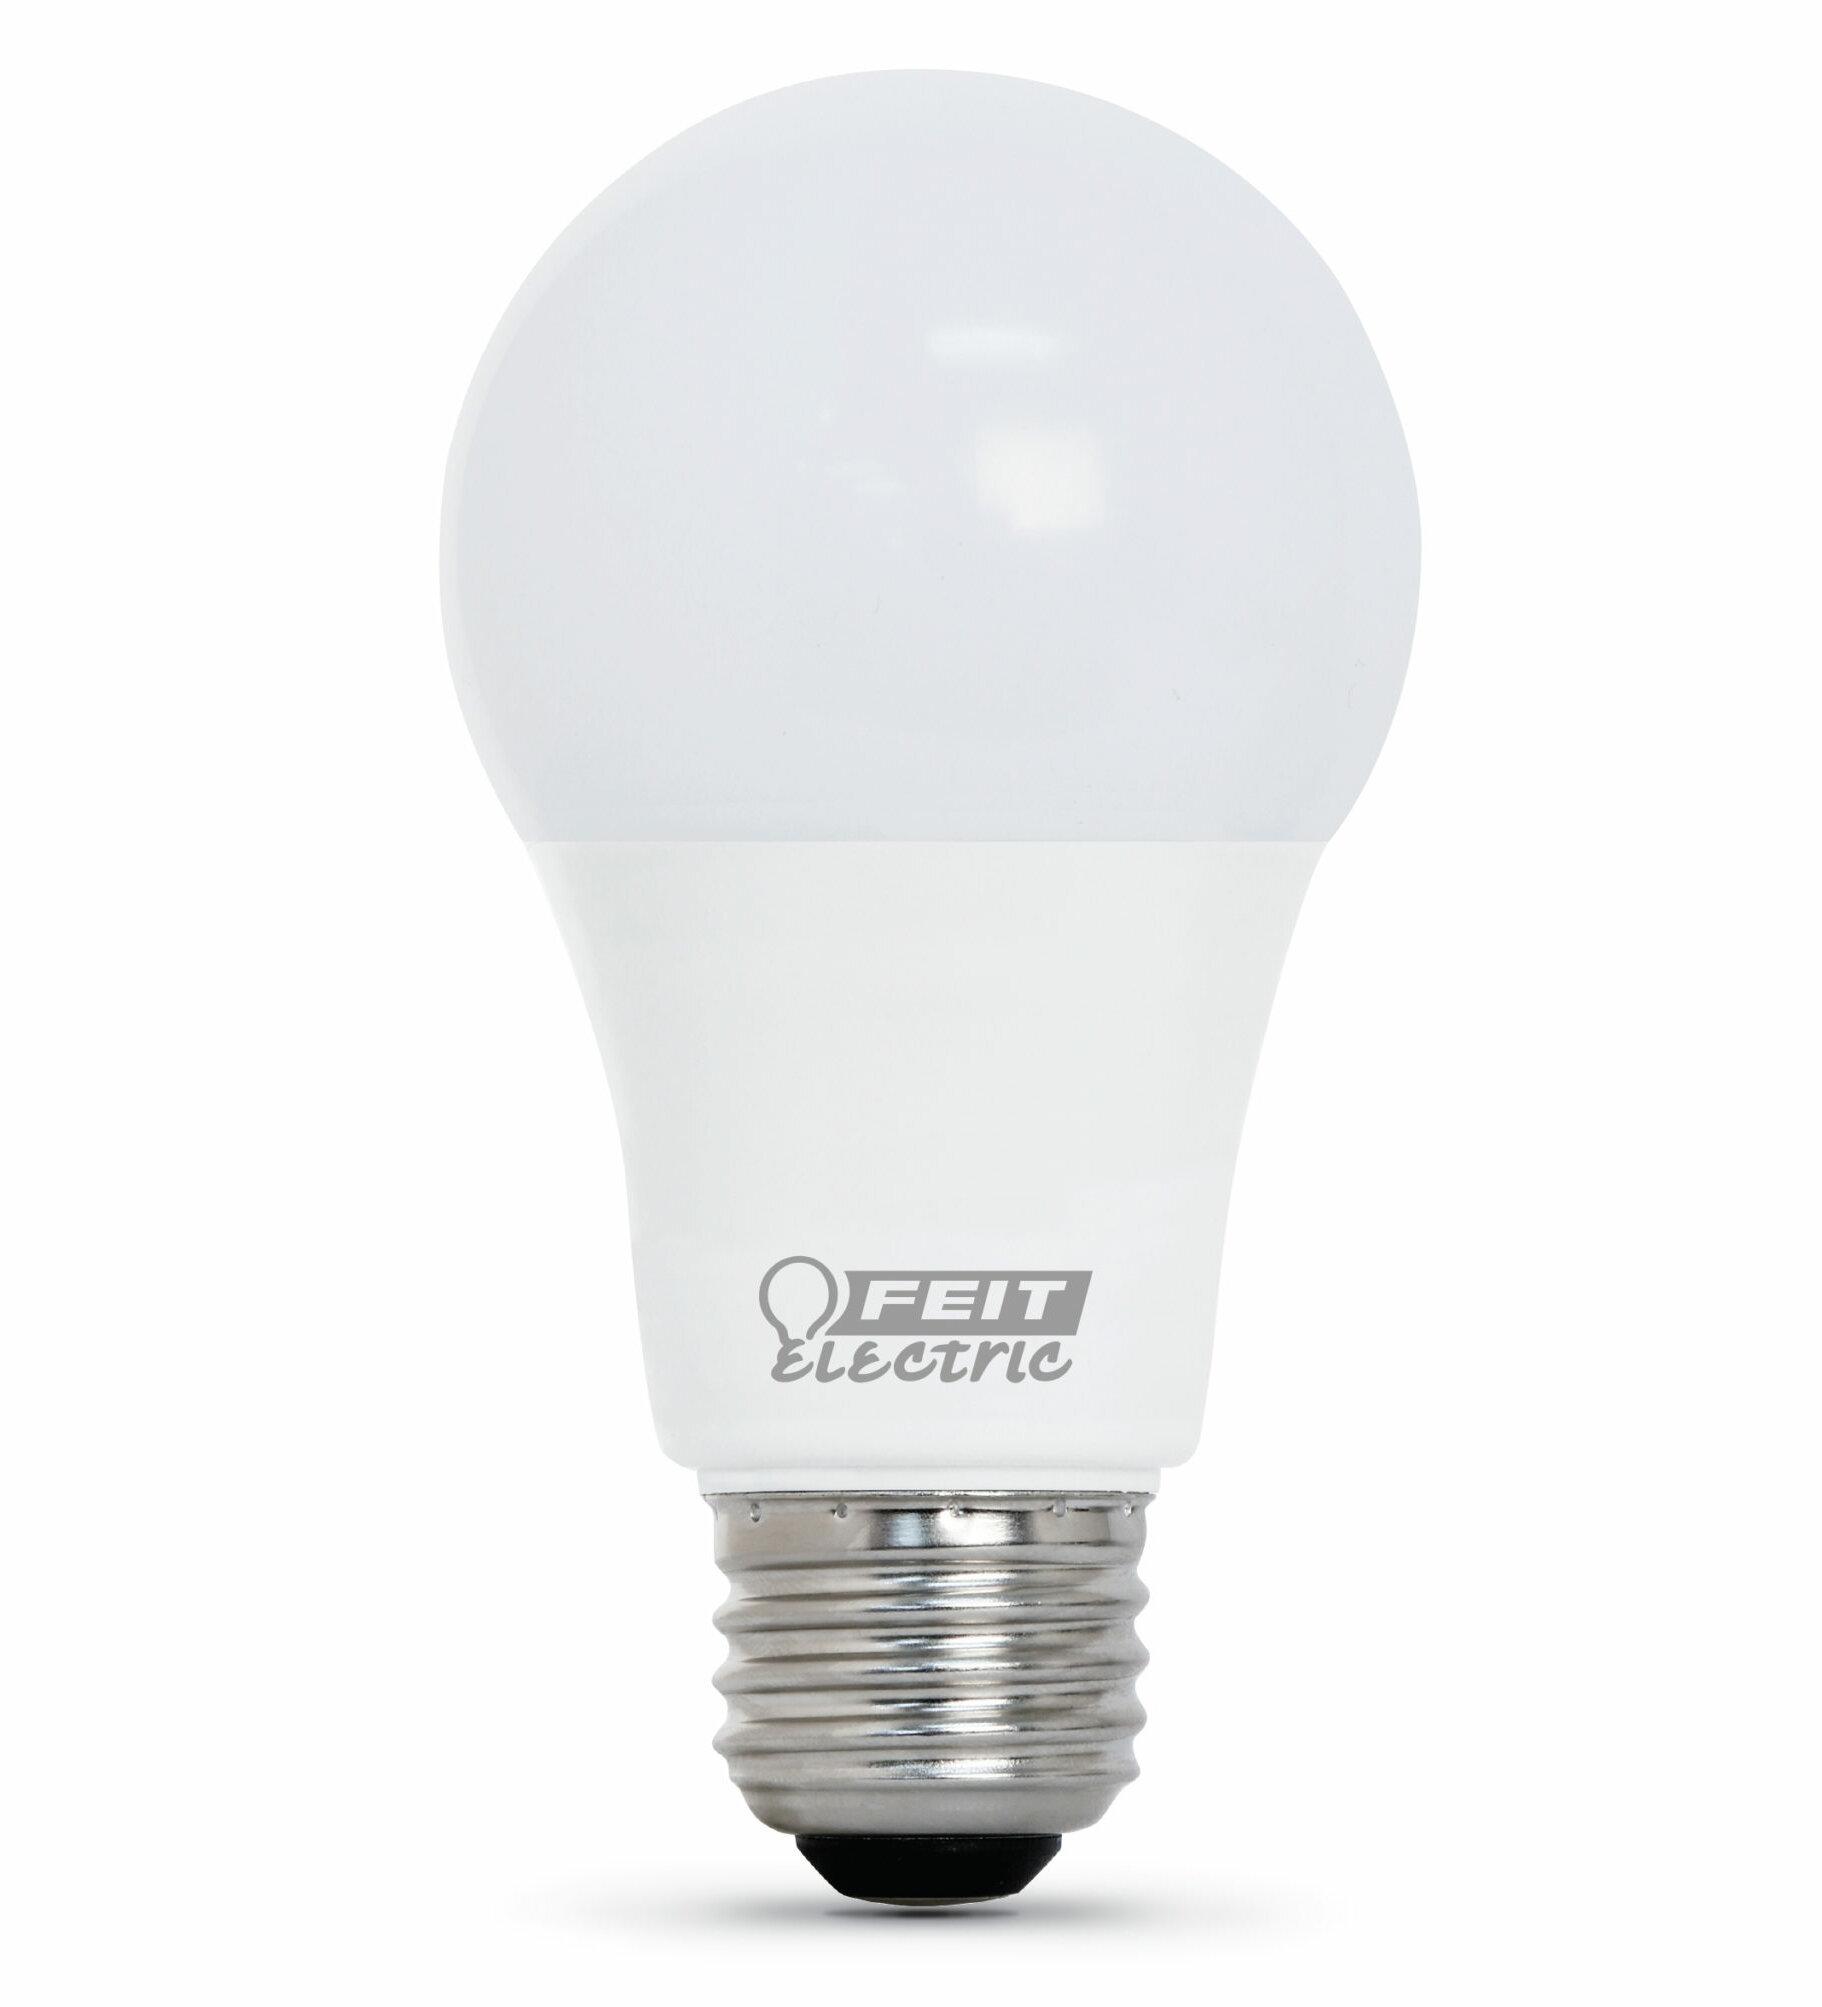 Feit Electric 60 Watt Equivalent A19 Led Non Dimmable Light Bulb E26 Medium Standard Base Wayfair